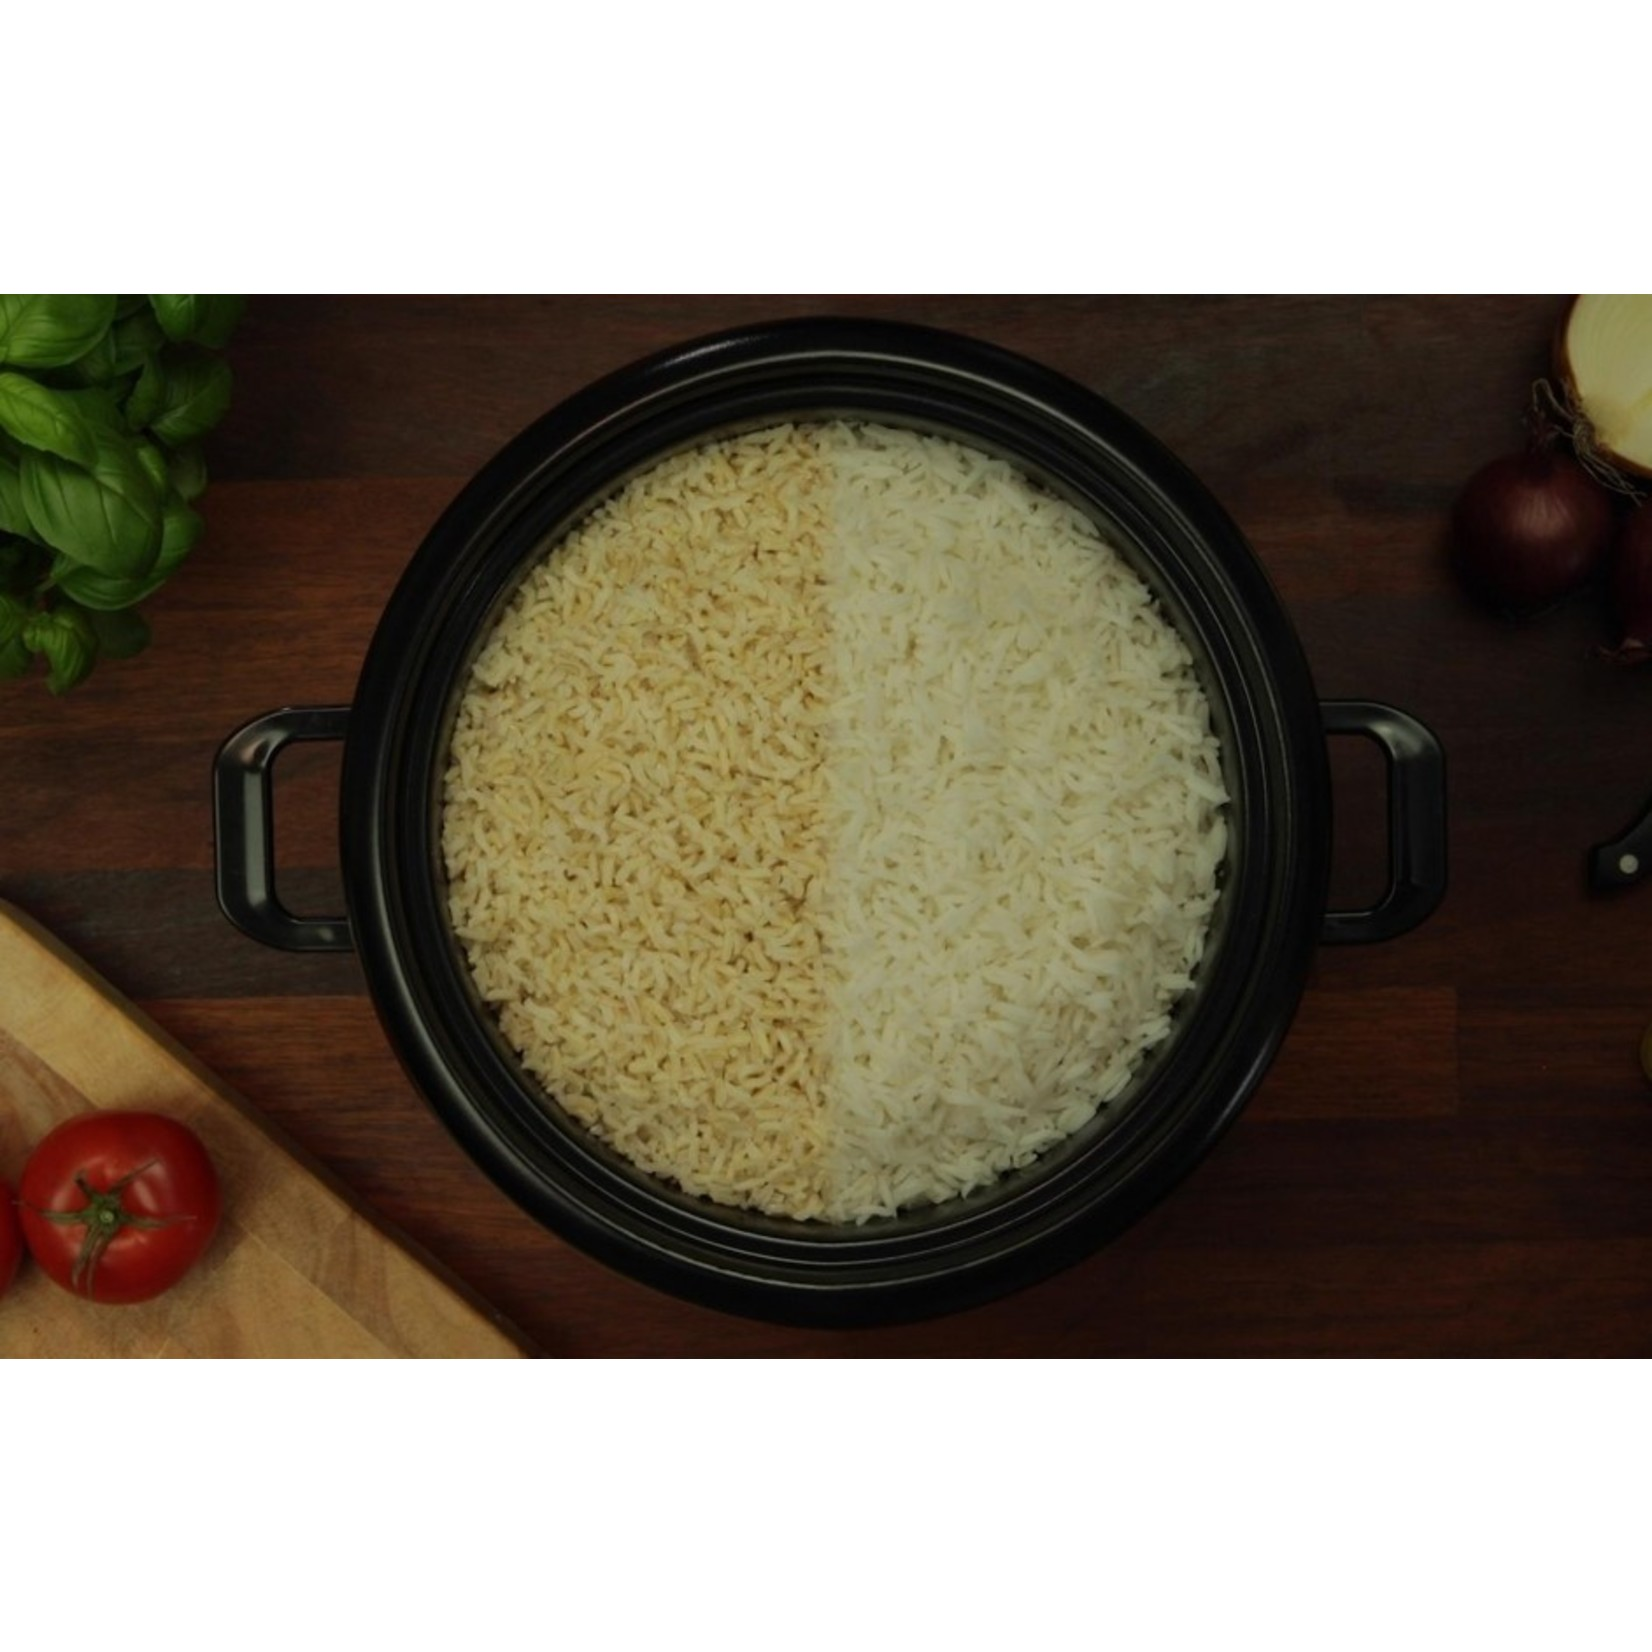 Crock-Pot Crock-Pot CRR029 rijstkoker met stoomtray 1,8L